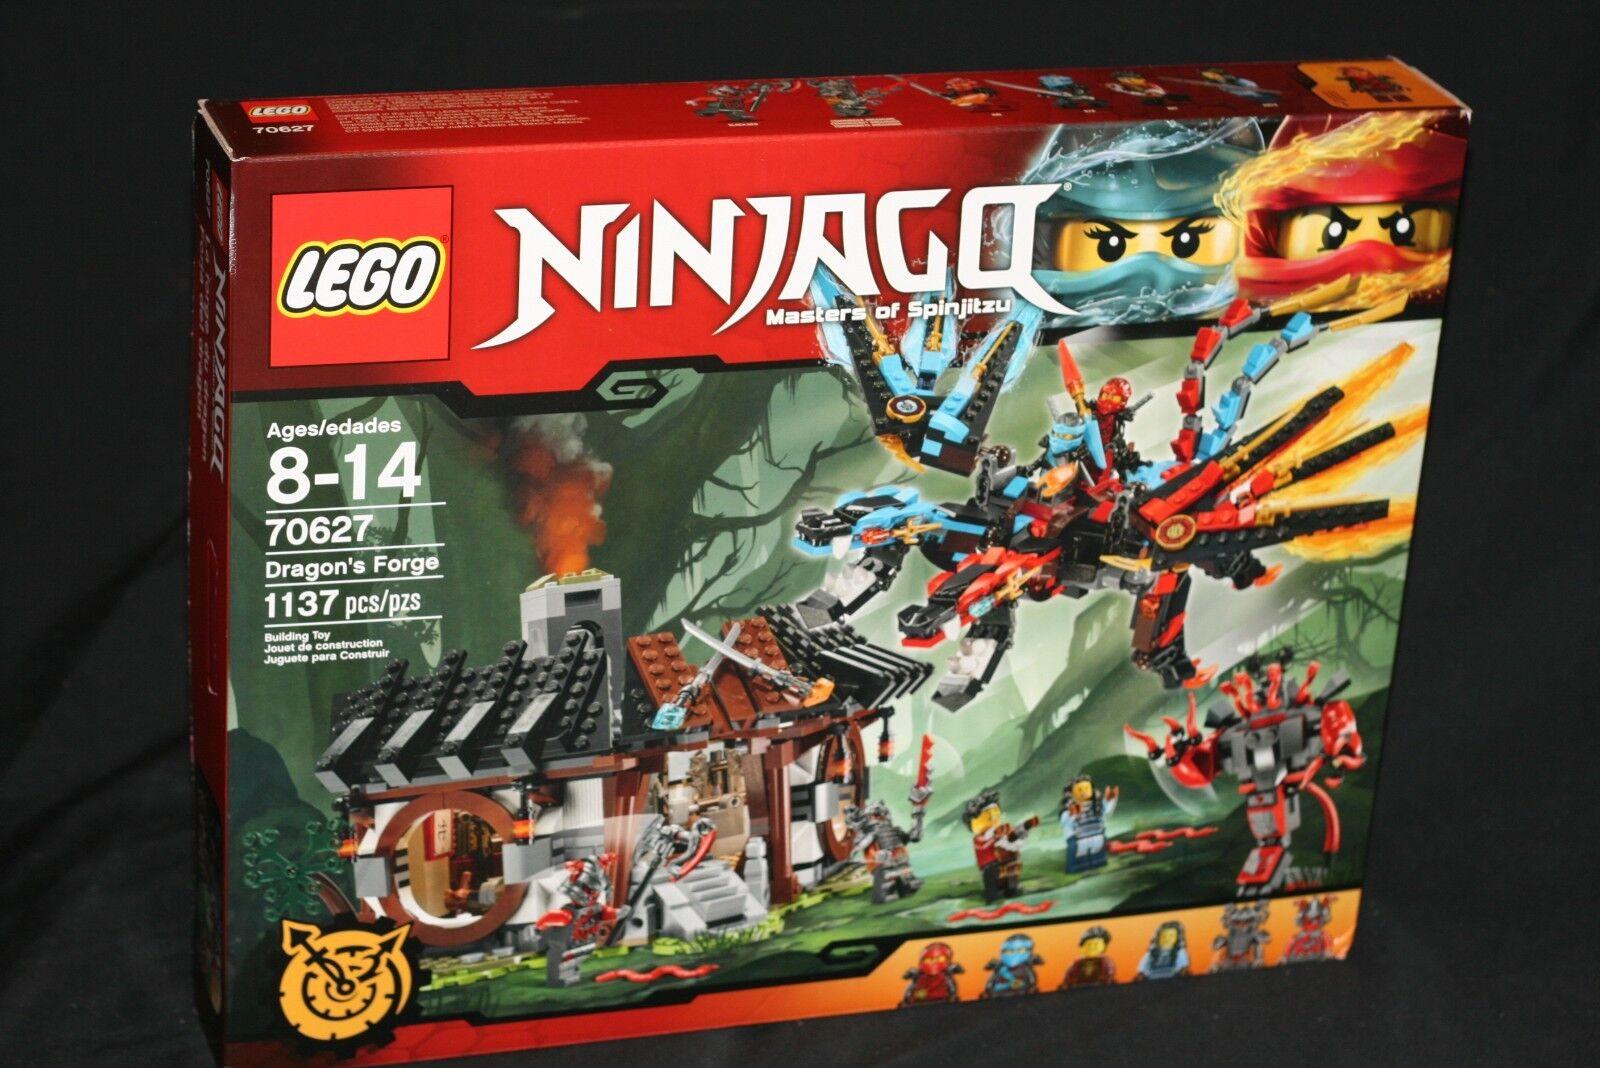 LEGO NINJAGO 70627 DRAGON'S FORGE (2017) RETIRED NEW & SEALED HTF 6 MINIFIGURES